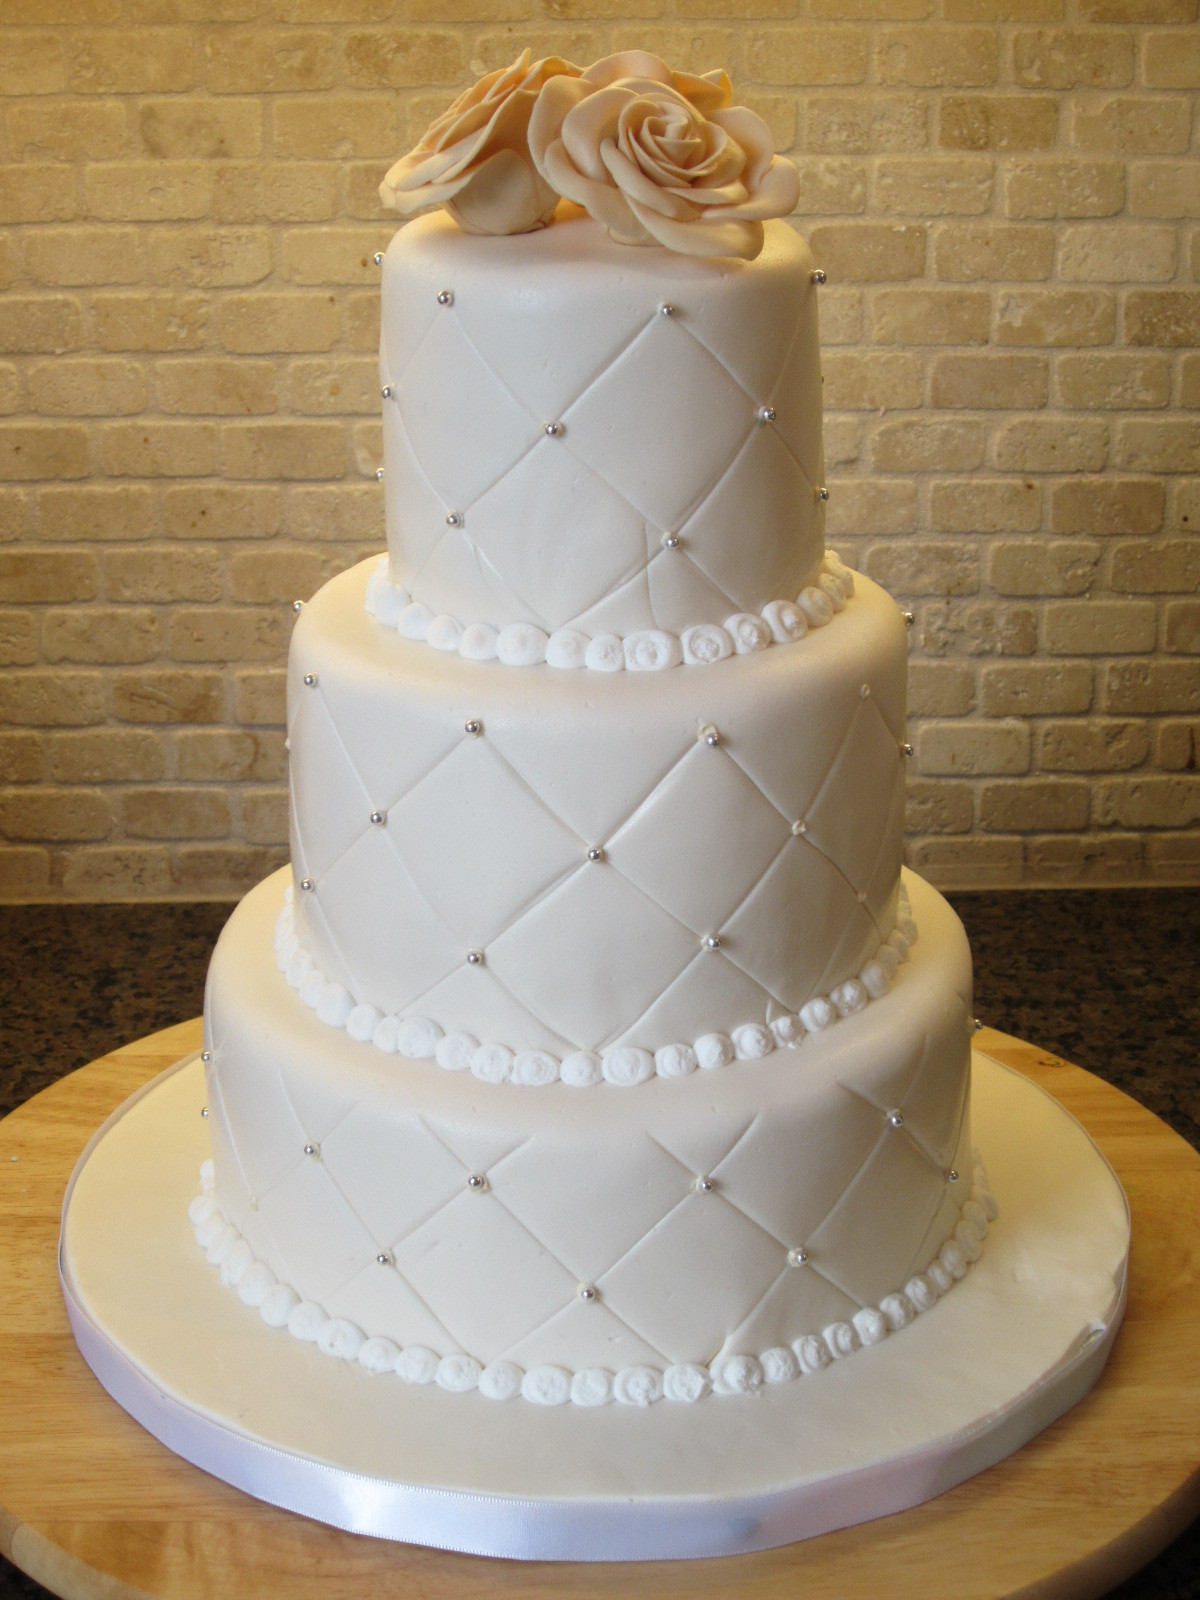 Wedding Cakes In Houston  Wedding cakes Houston Tx Get affordable cheap priced